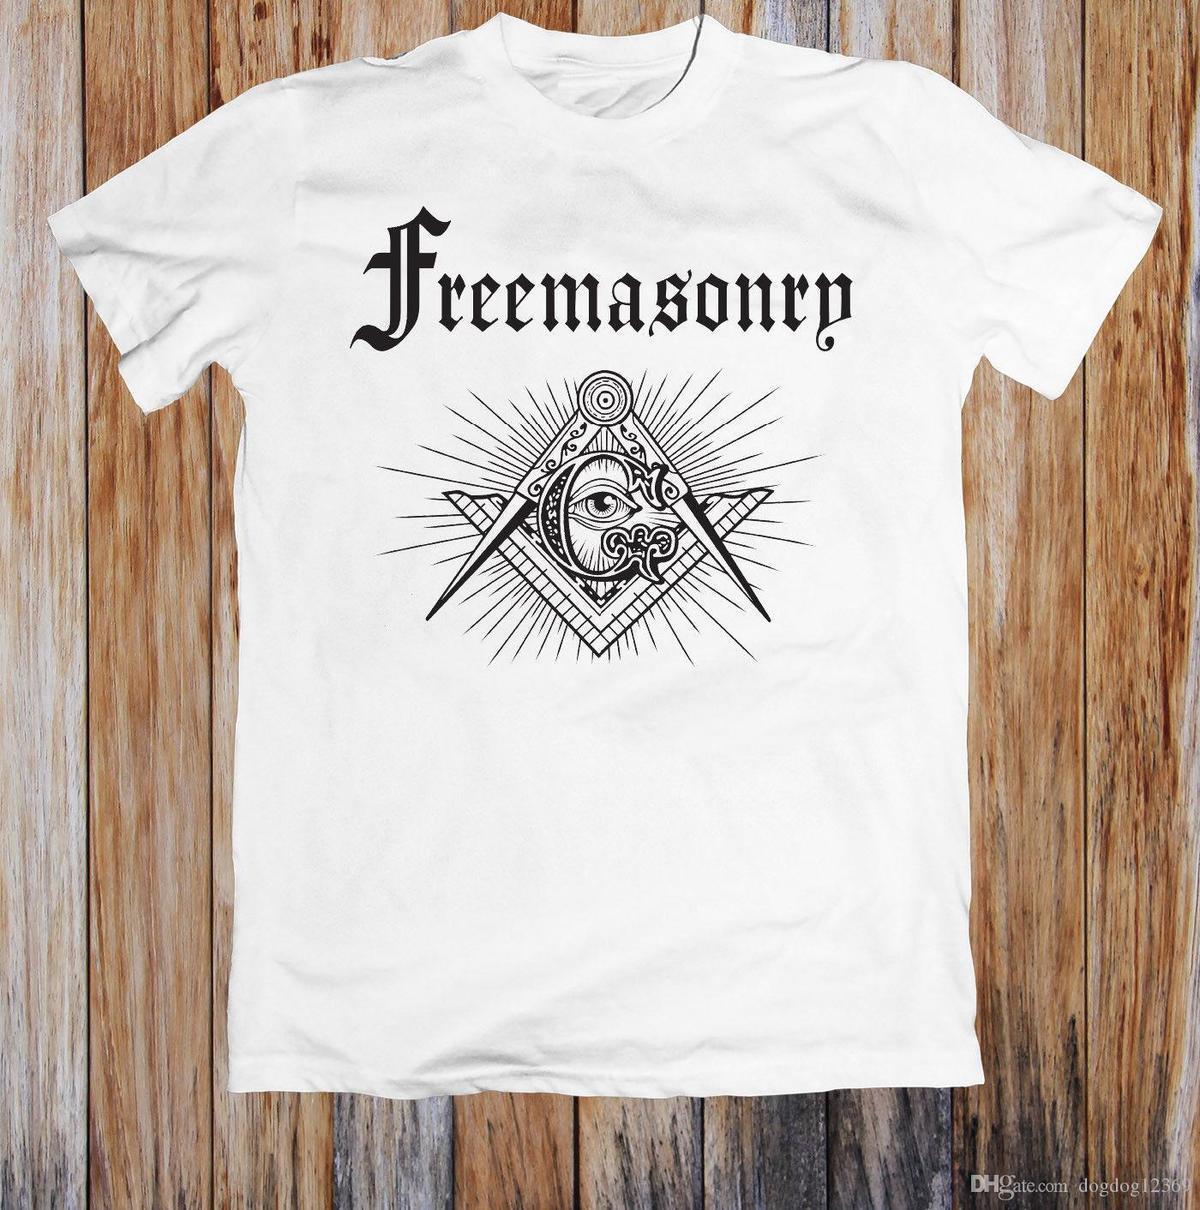 1107f6c4 FREEMASONRY MASONIC BLUE LODGE LOGO UNISEX T SHIRT Business Tee Shirts  Printing Coolest T Shirts Online From Jie67, $14.67  DHgate.Com